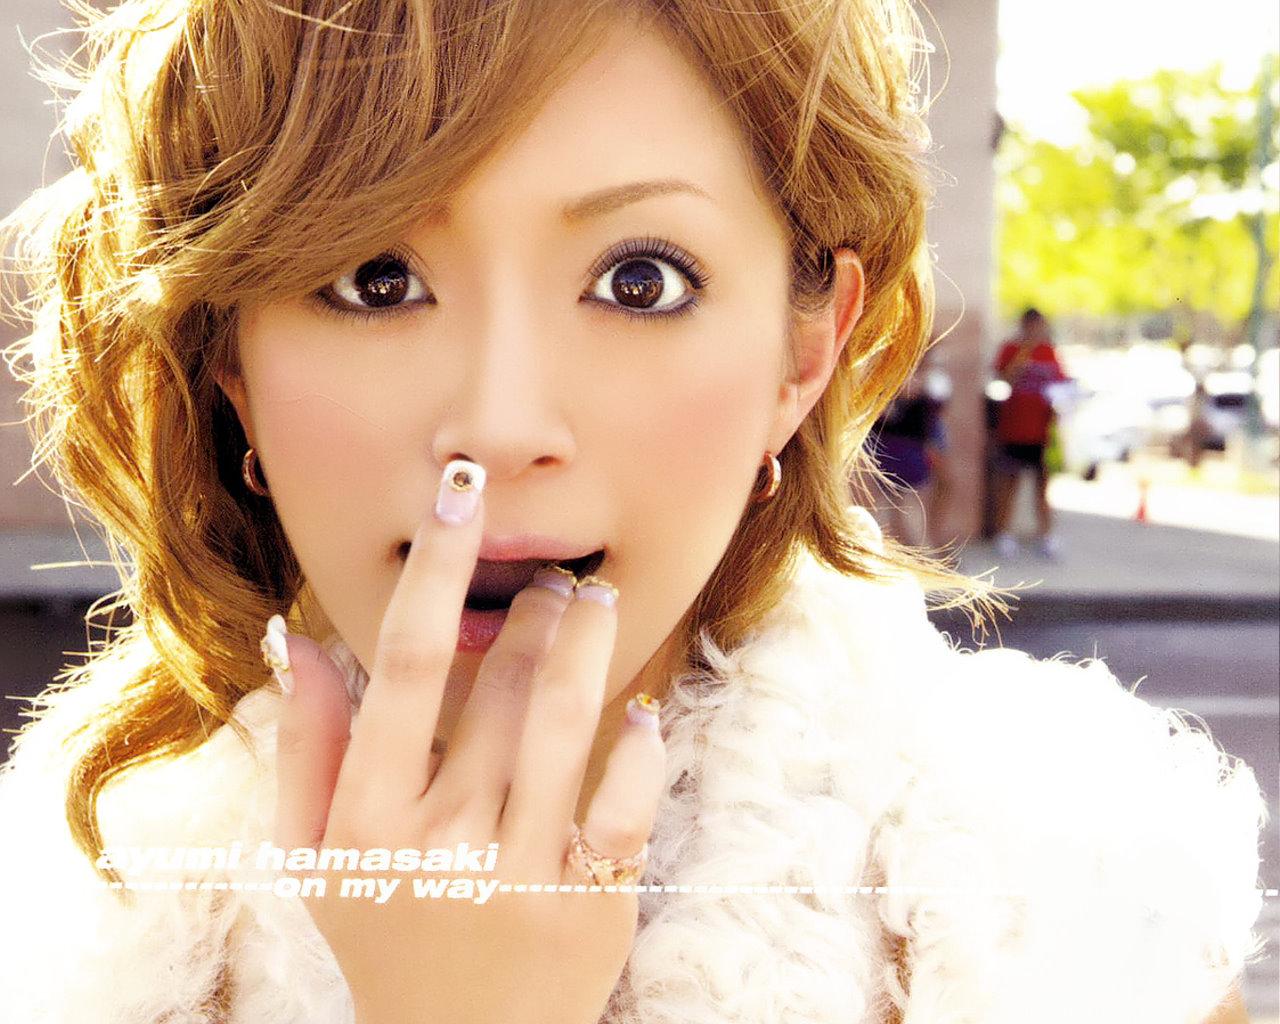 Ayumi Hamasaki - Picture Colection